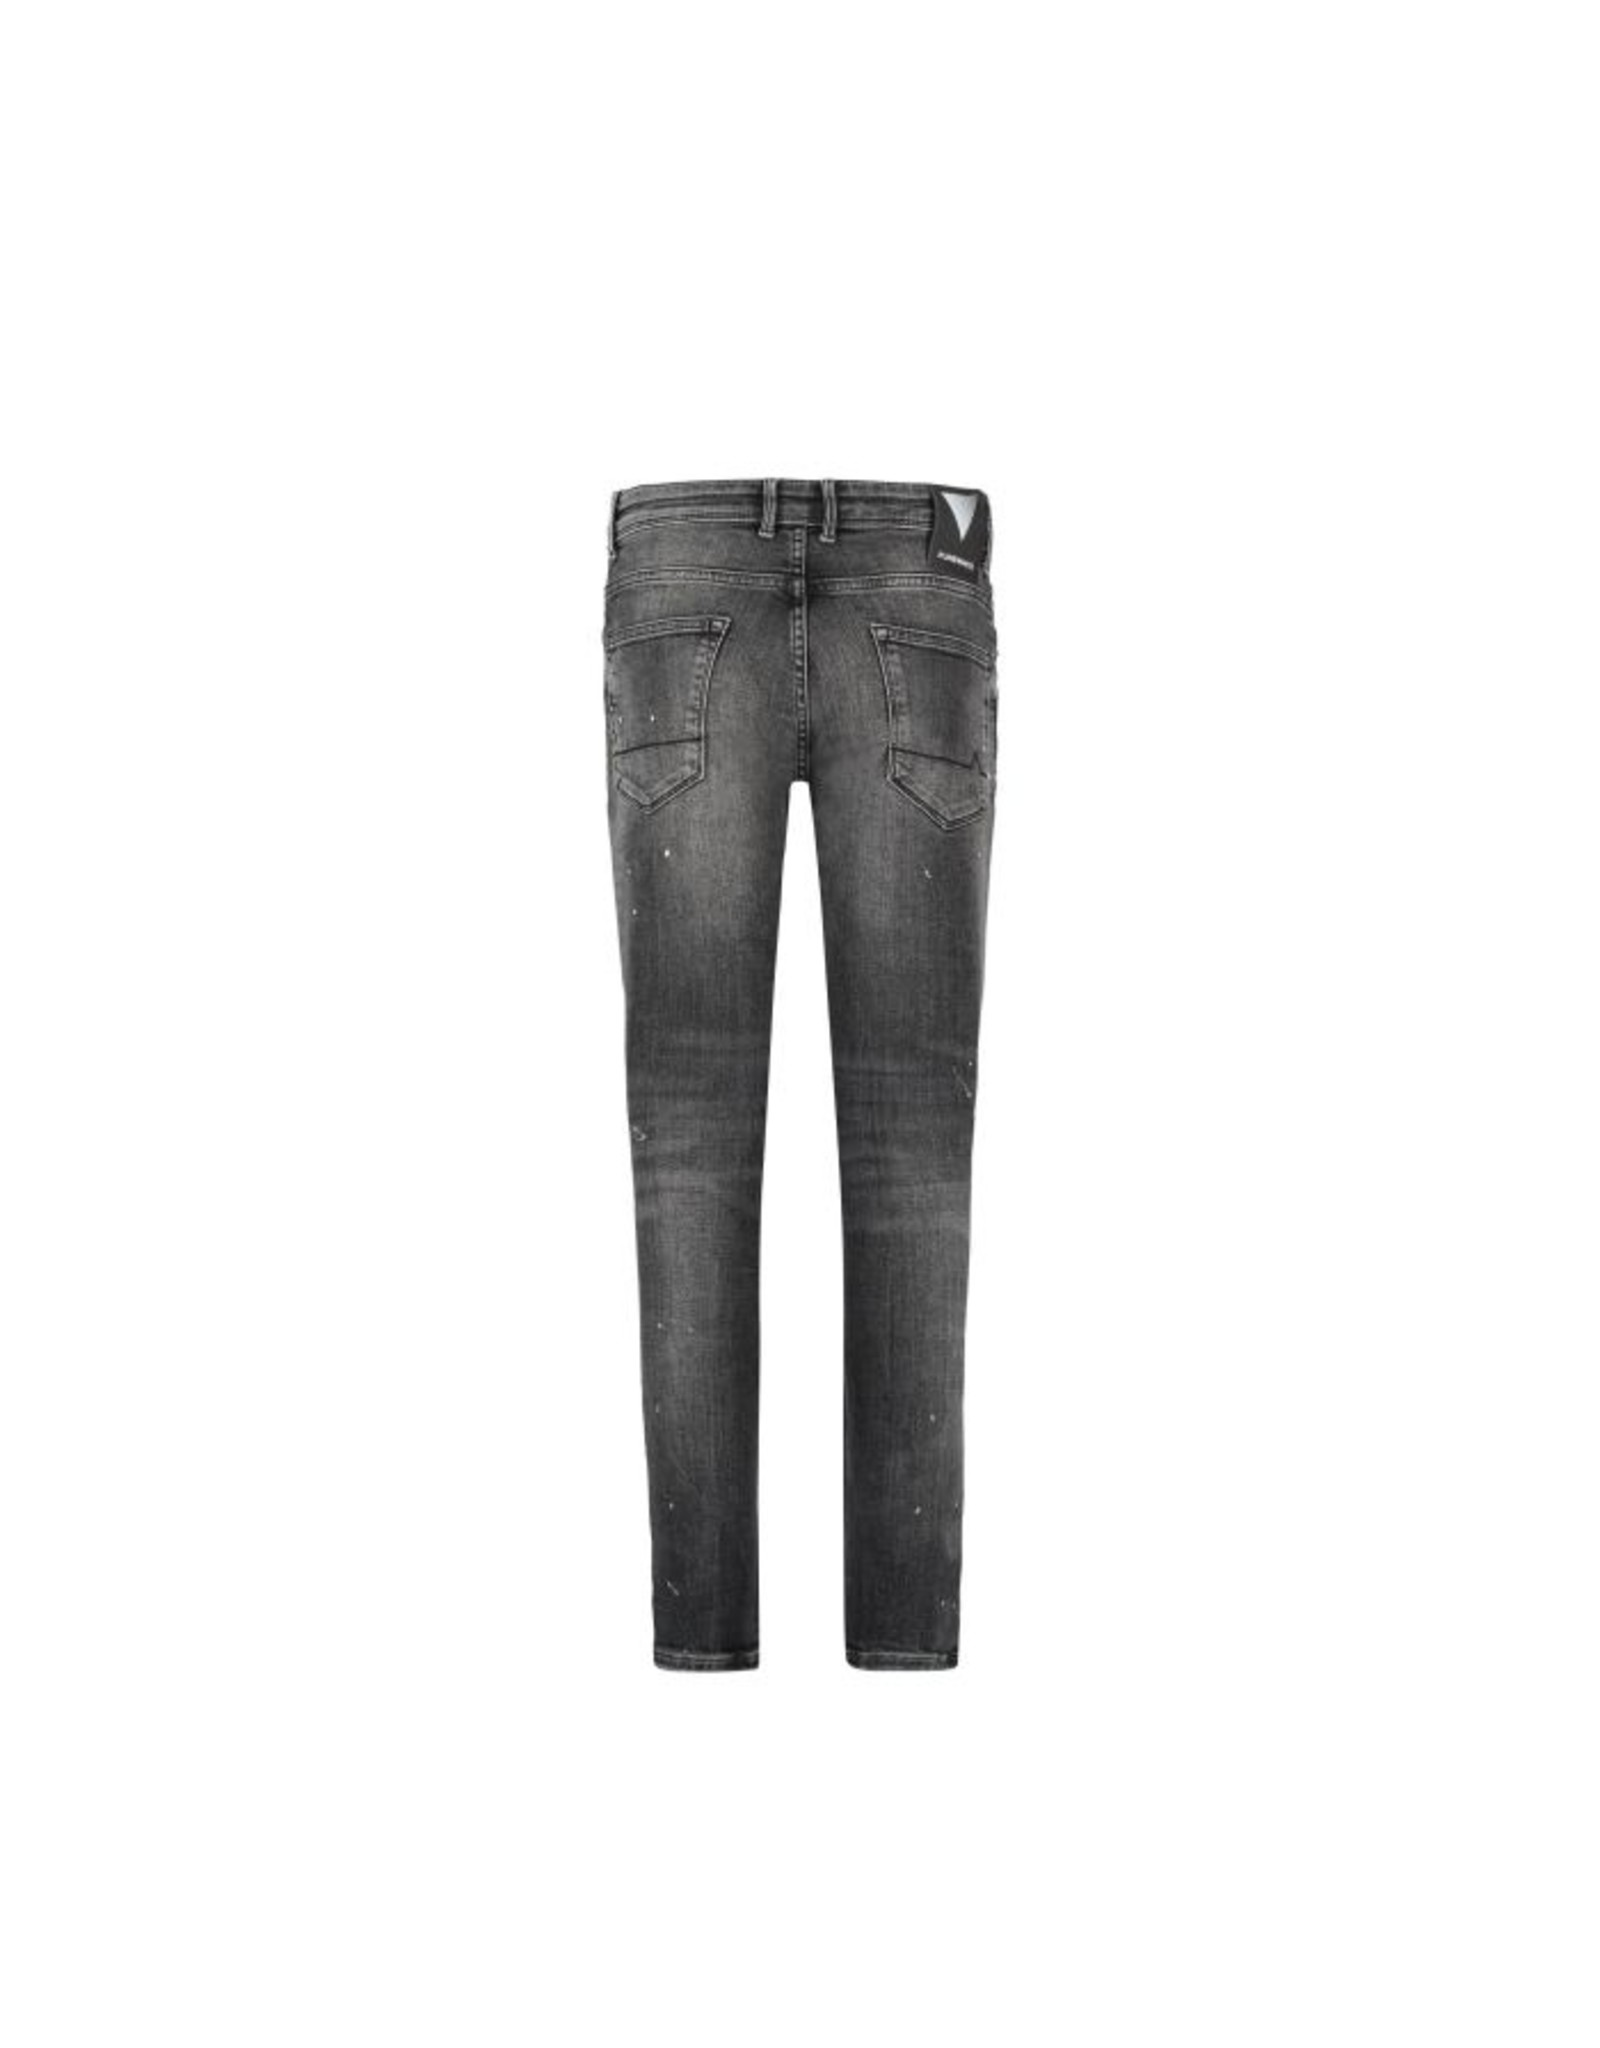 Ballin Amsterdam Jeans Grey Melange